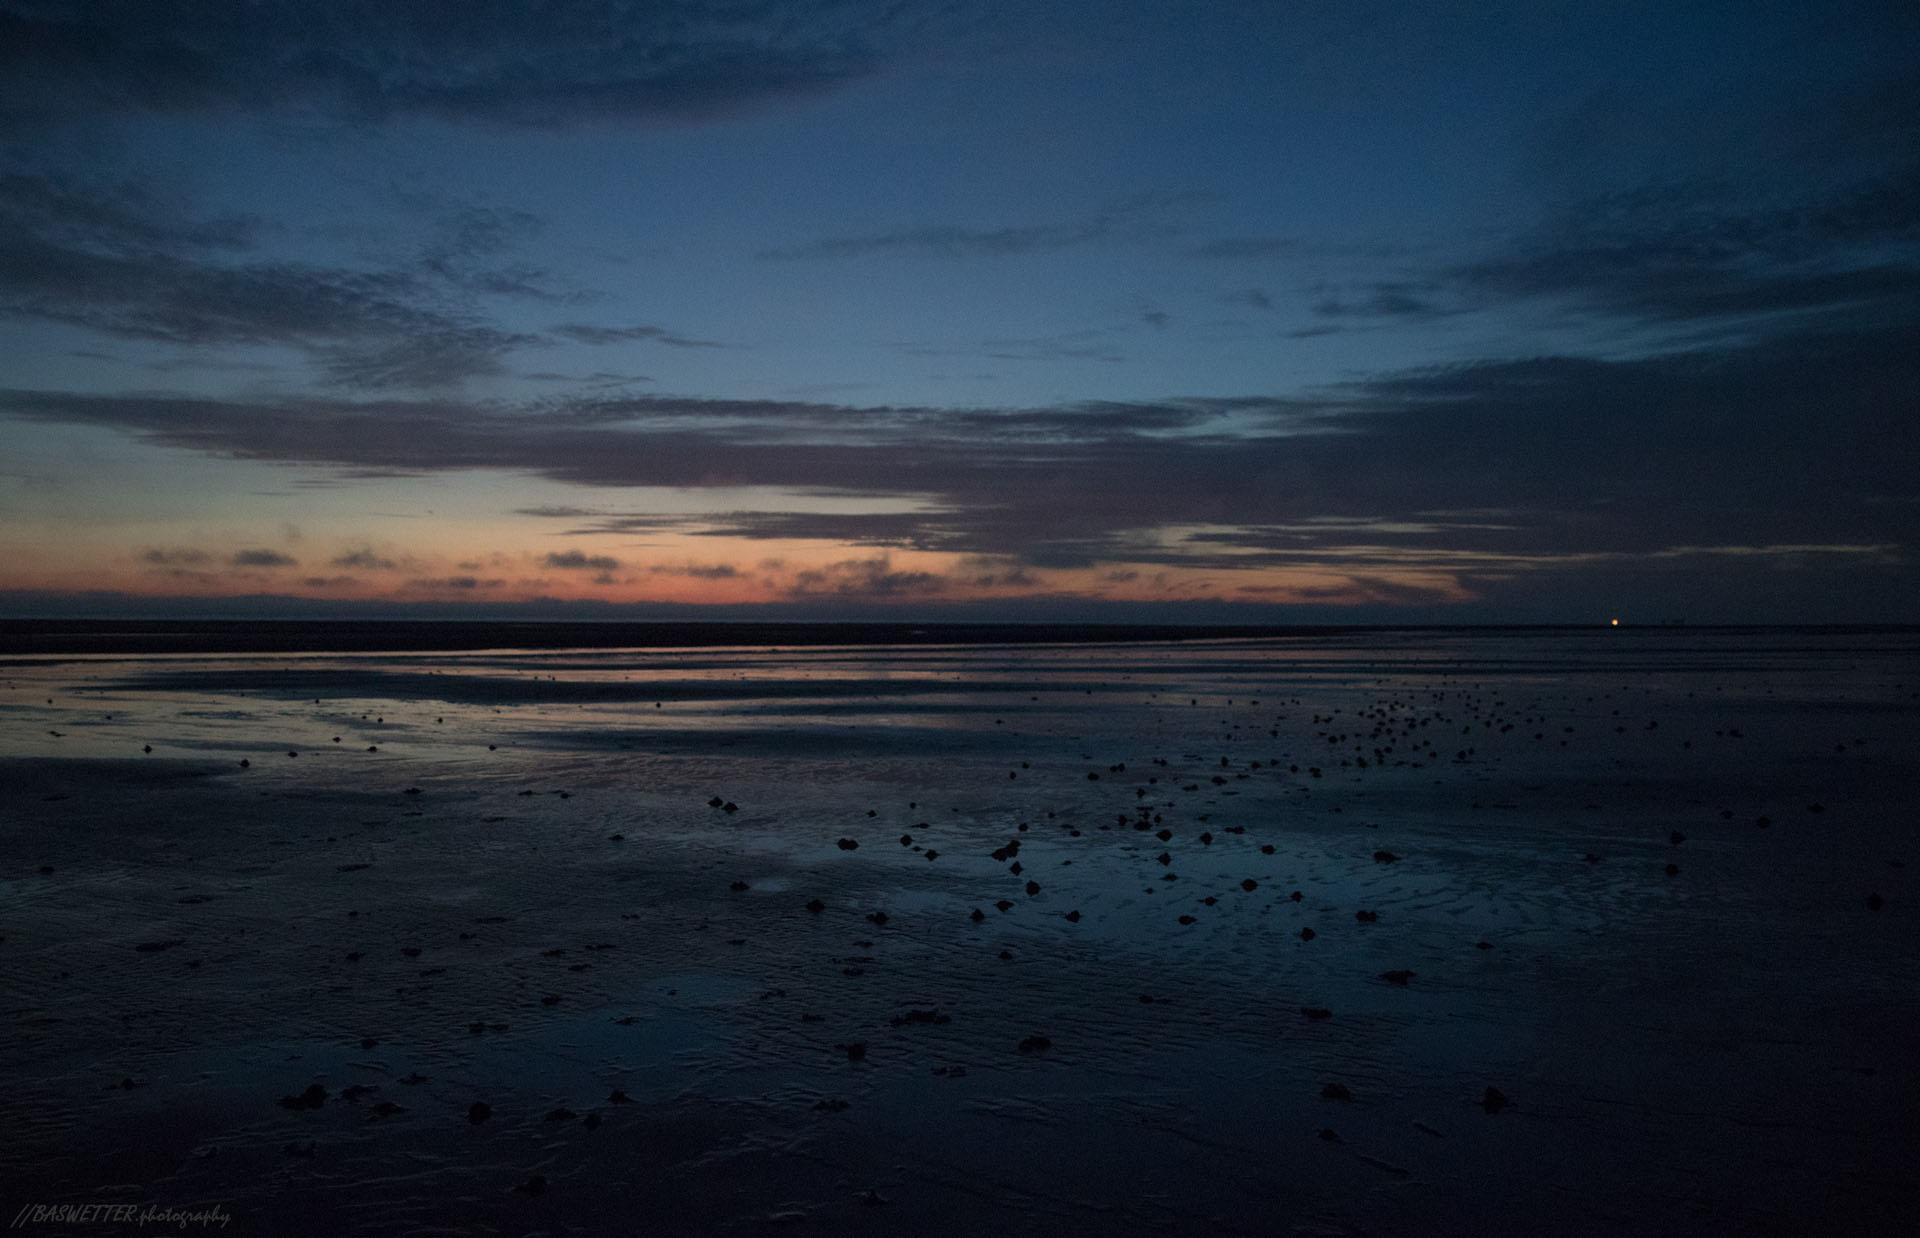 Strand vlak na zonsondergang